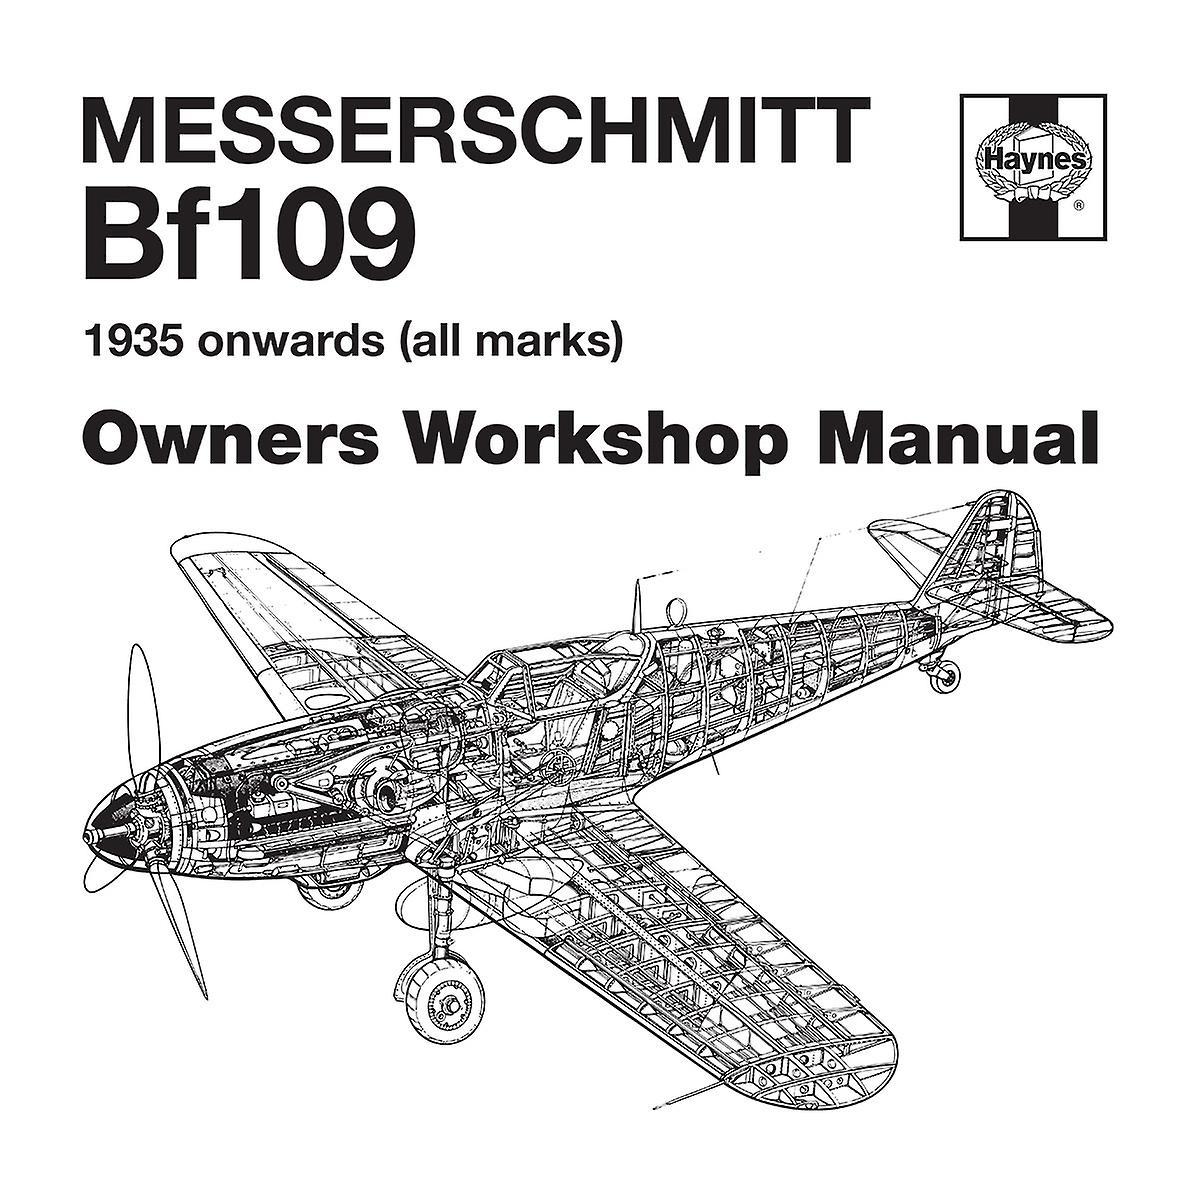 Haynes Owners Workshop Manual Messerschmitt Bf109 Men's